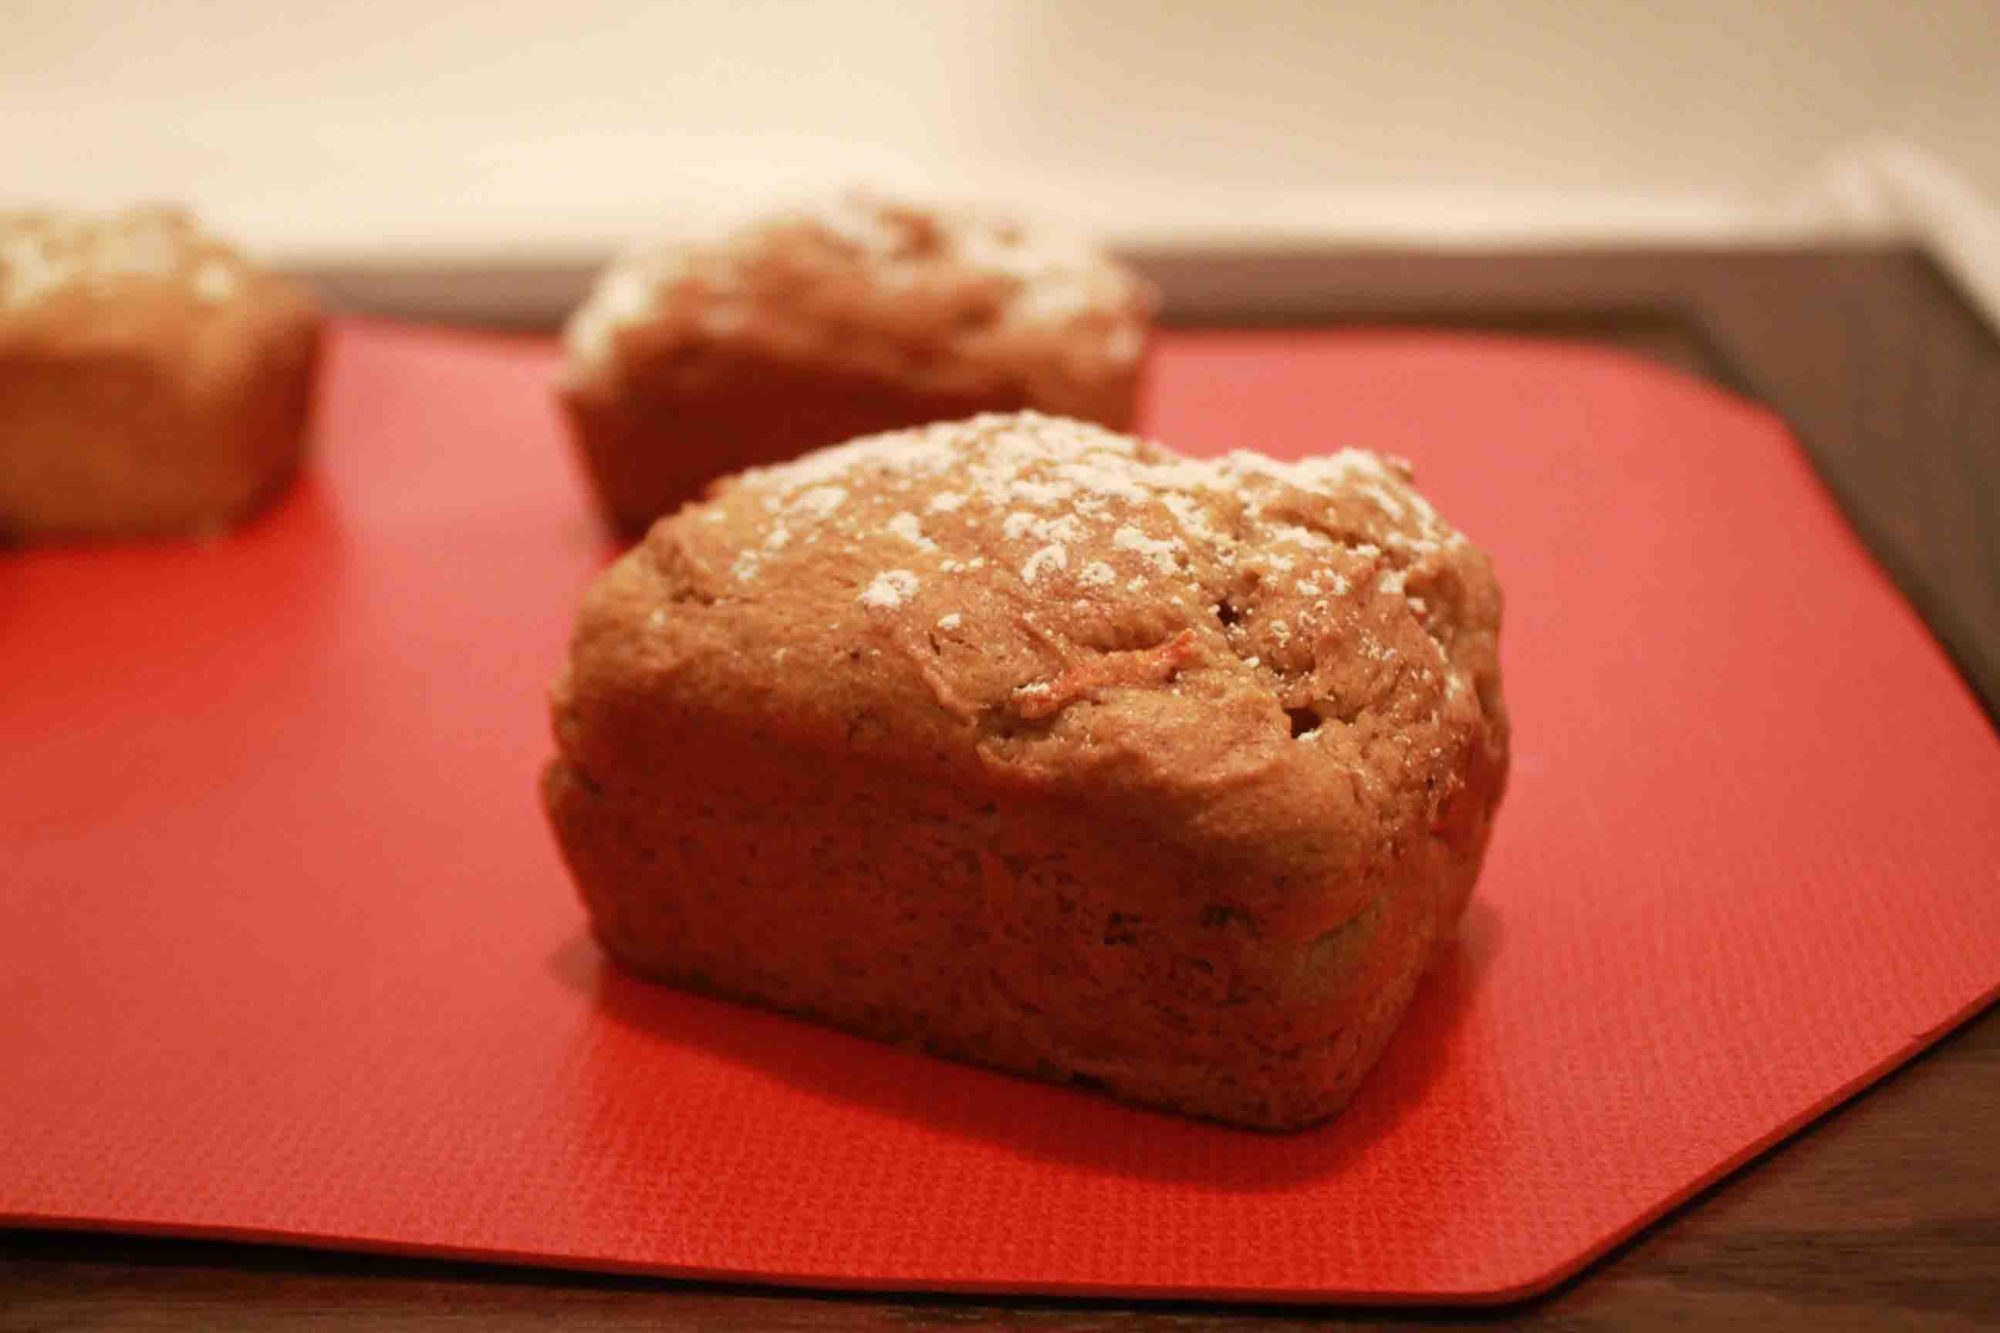 Carrot Cake Loaf All Recipes: Gluten Free Mini Carrot Cake Loaf Recipe